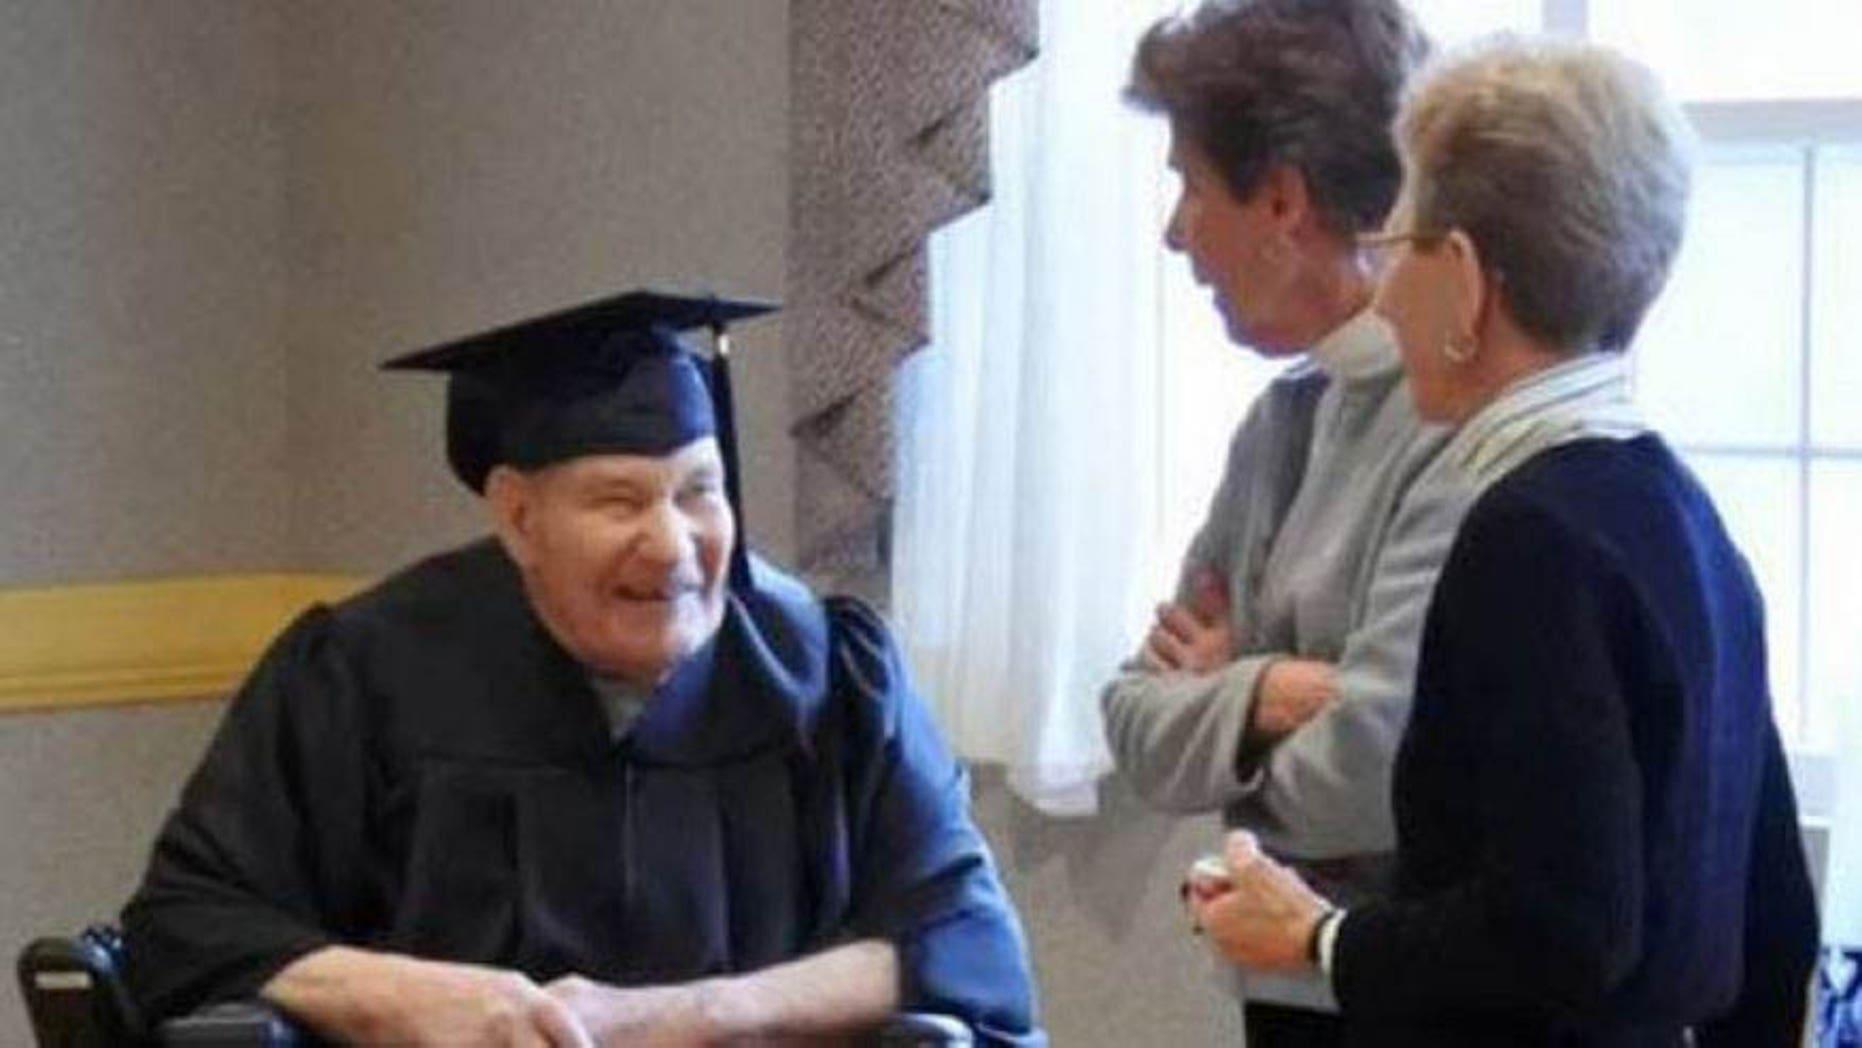 90-year-old World War II Navy Seabee Lou Schipper was awarded his high school diploma Friday. (St. Xavier High School)